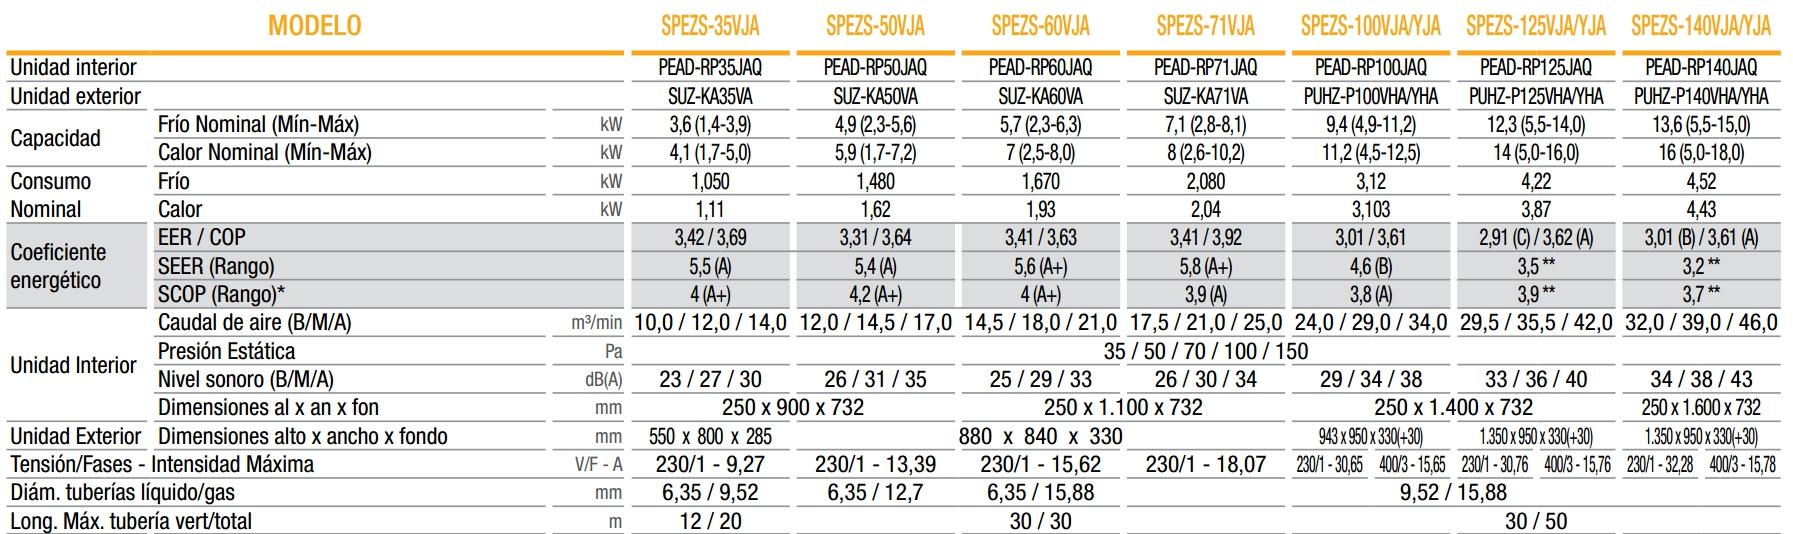 Ficha técnica aire por conductos SPEZS-100 YJA